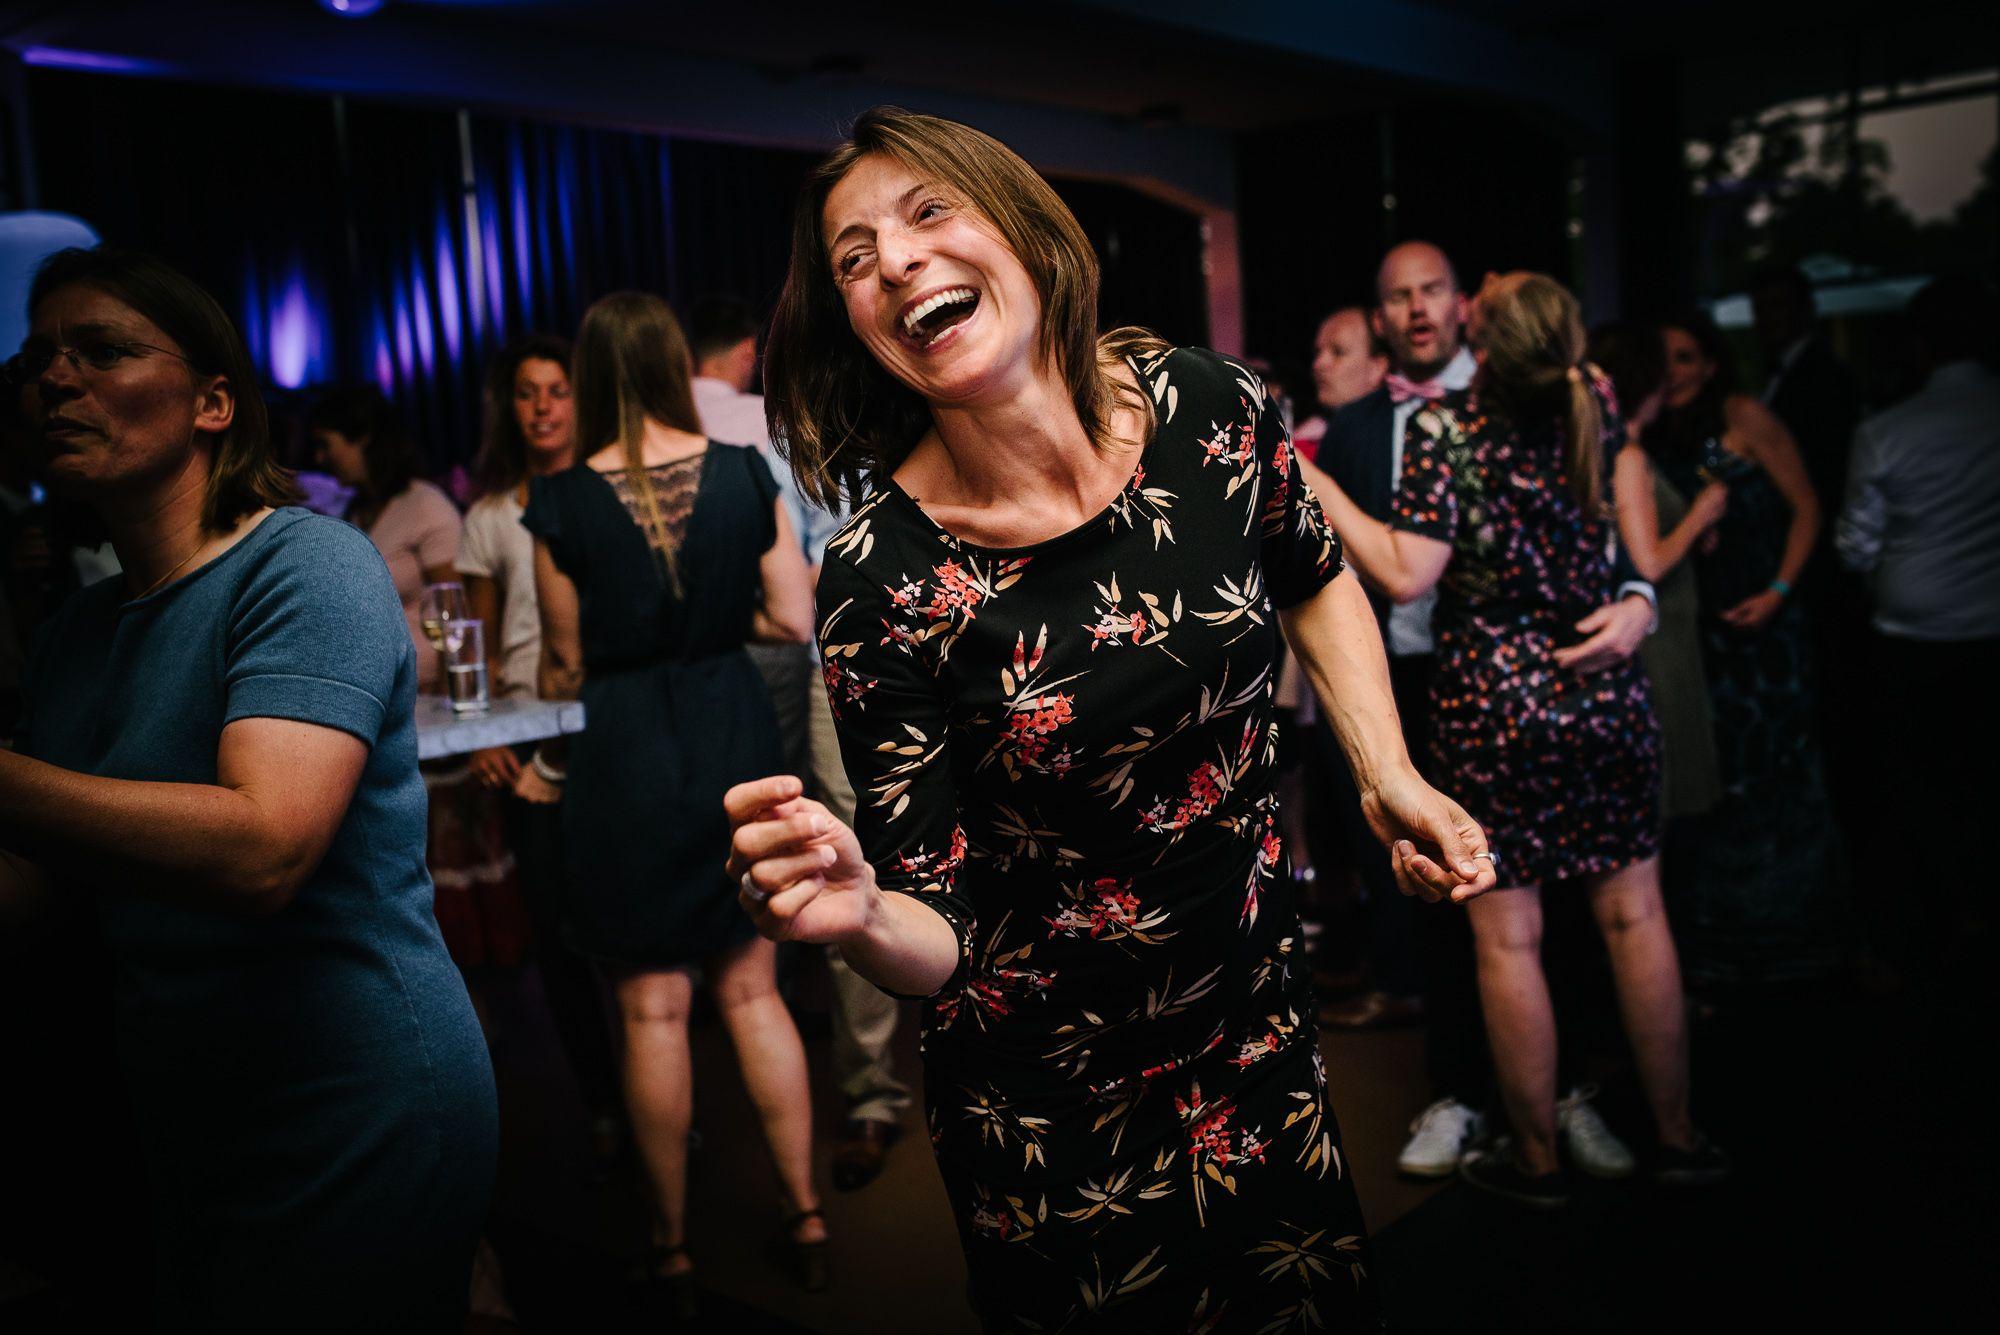 spontane feestfoto's bruiloft bruidsfotograaf hilversum